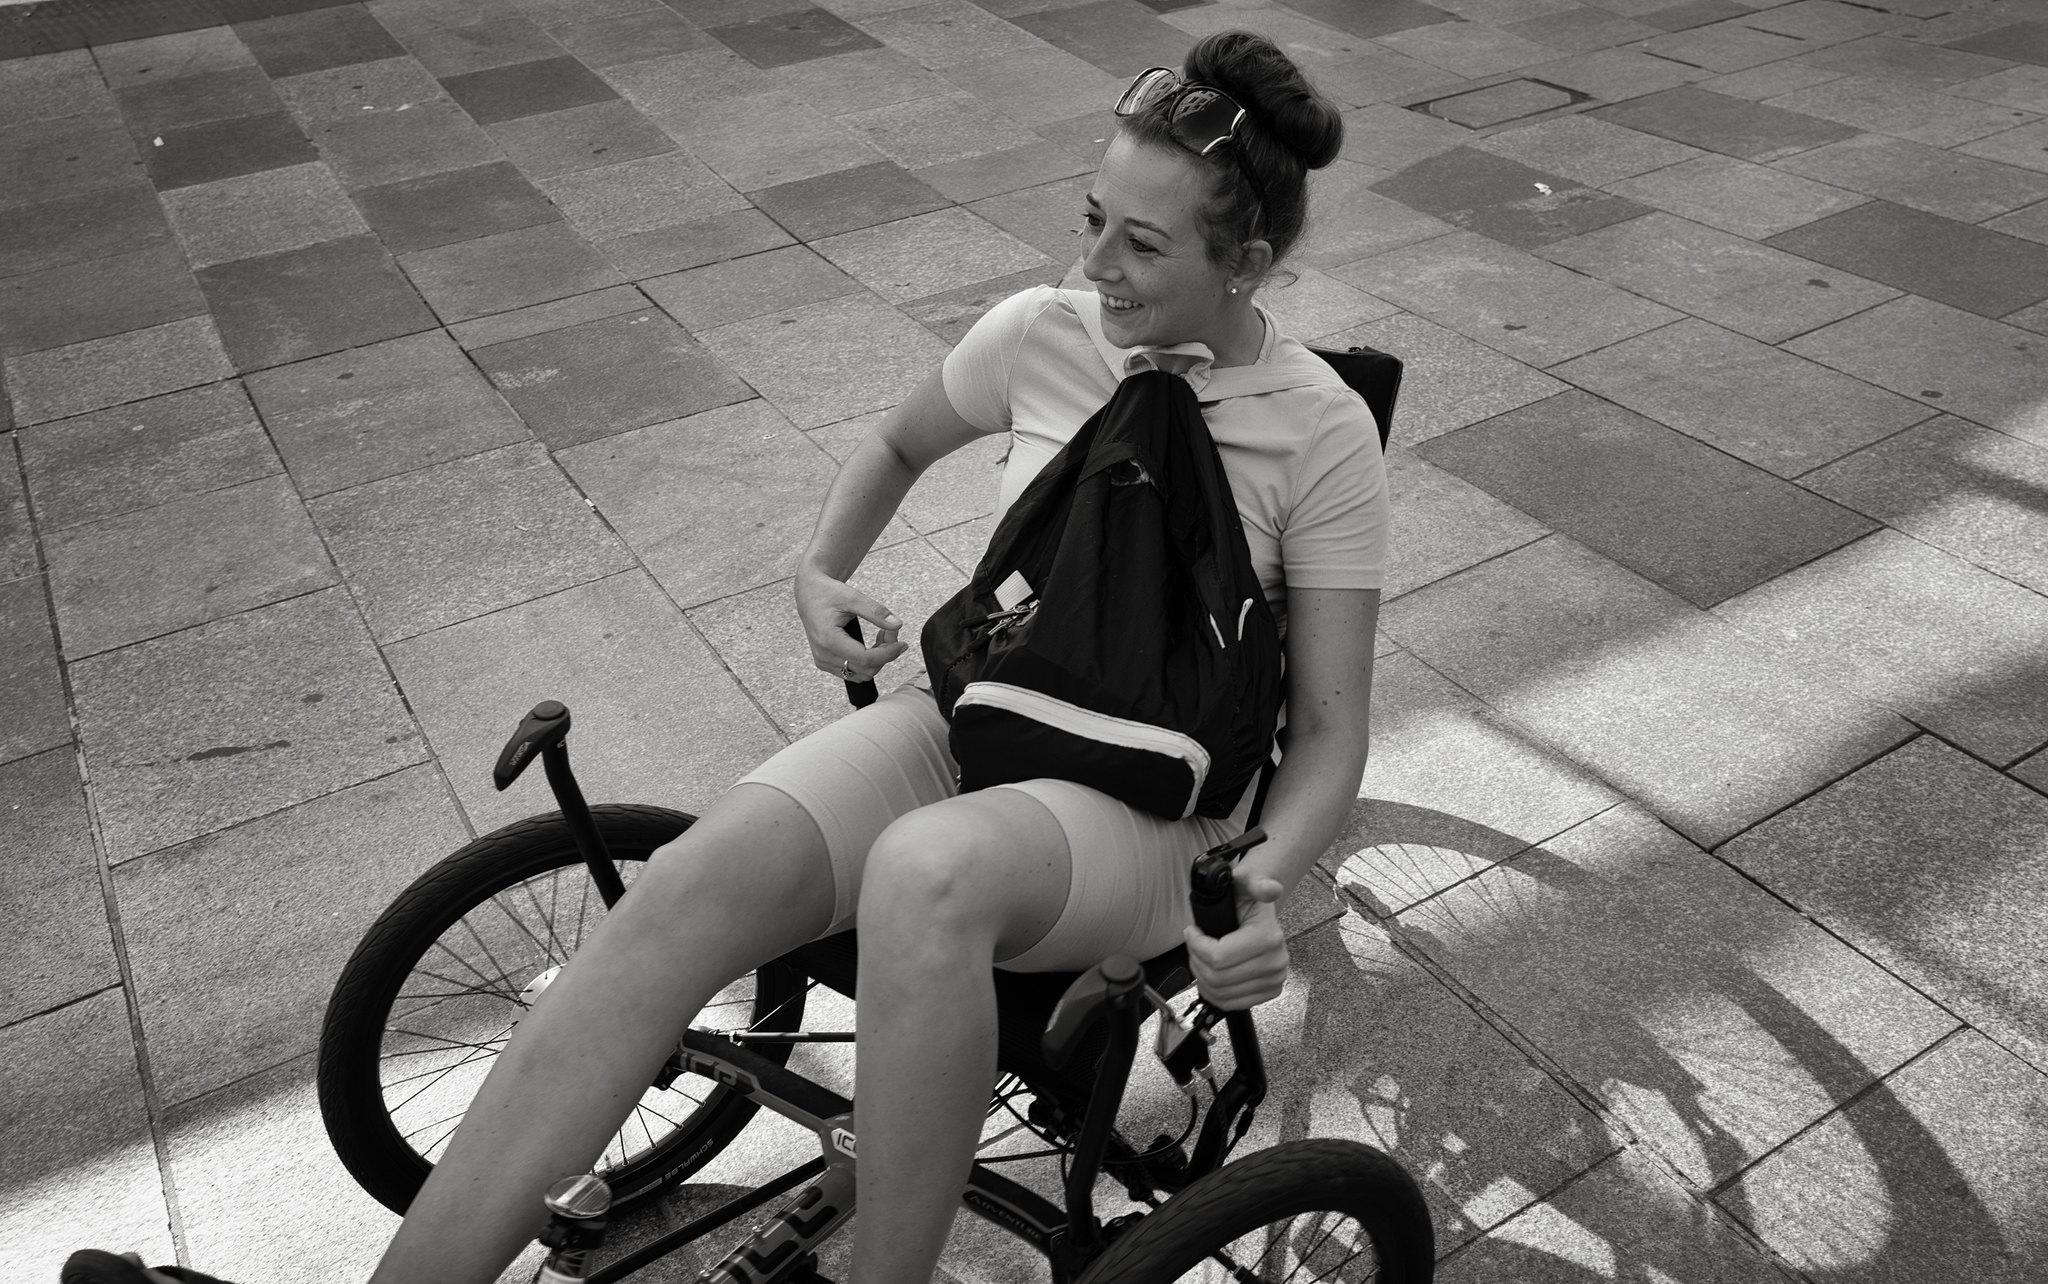 Trike in Cardiff